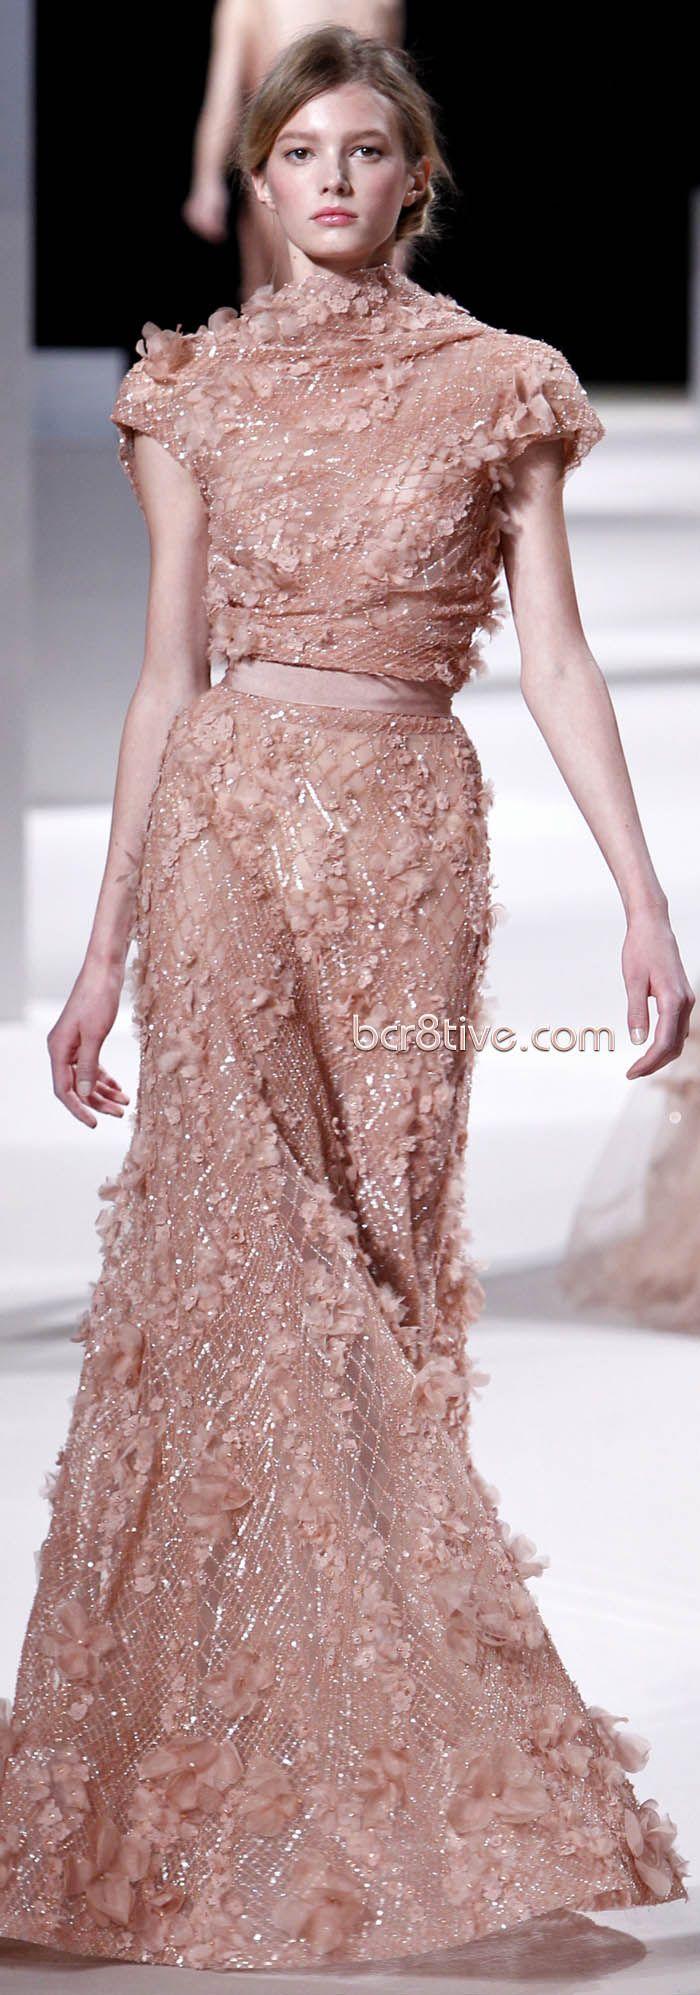 Elie Saab Spring Summer 2011 Haute Couture   Vestidos para fiestas ...